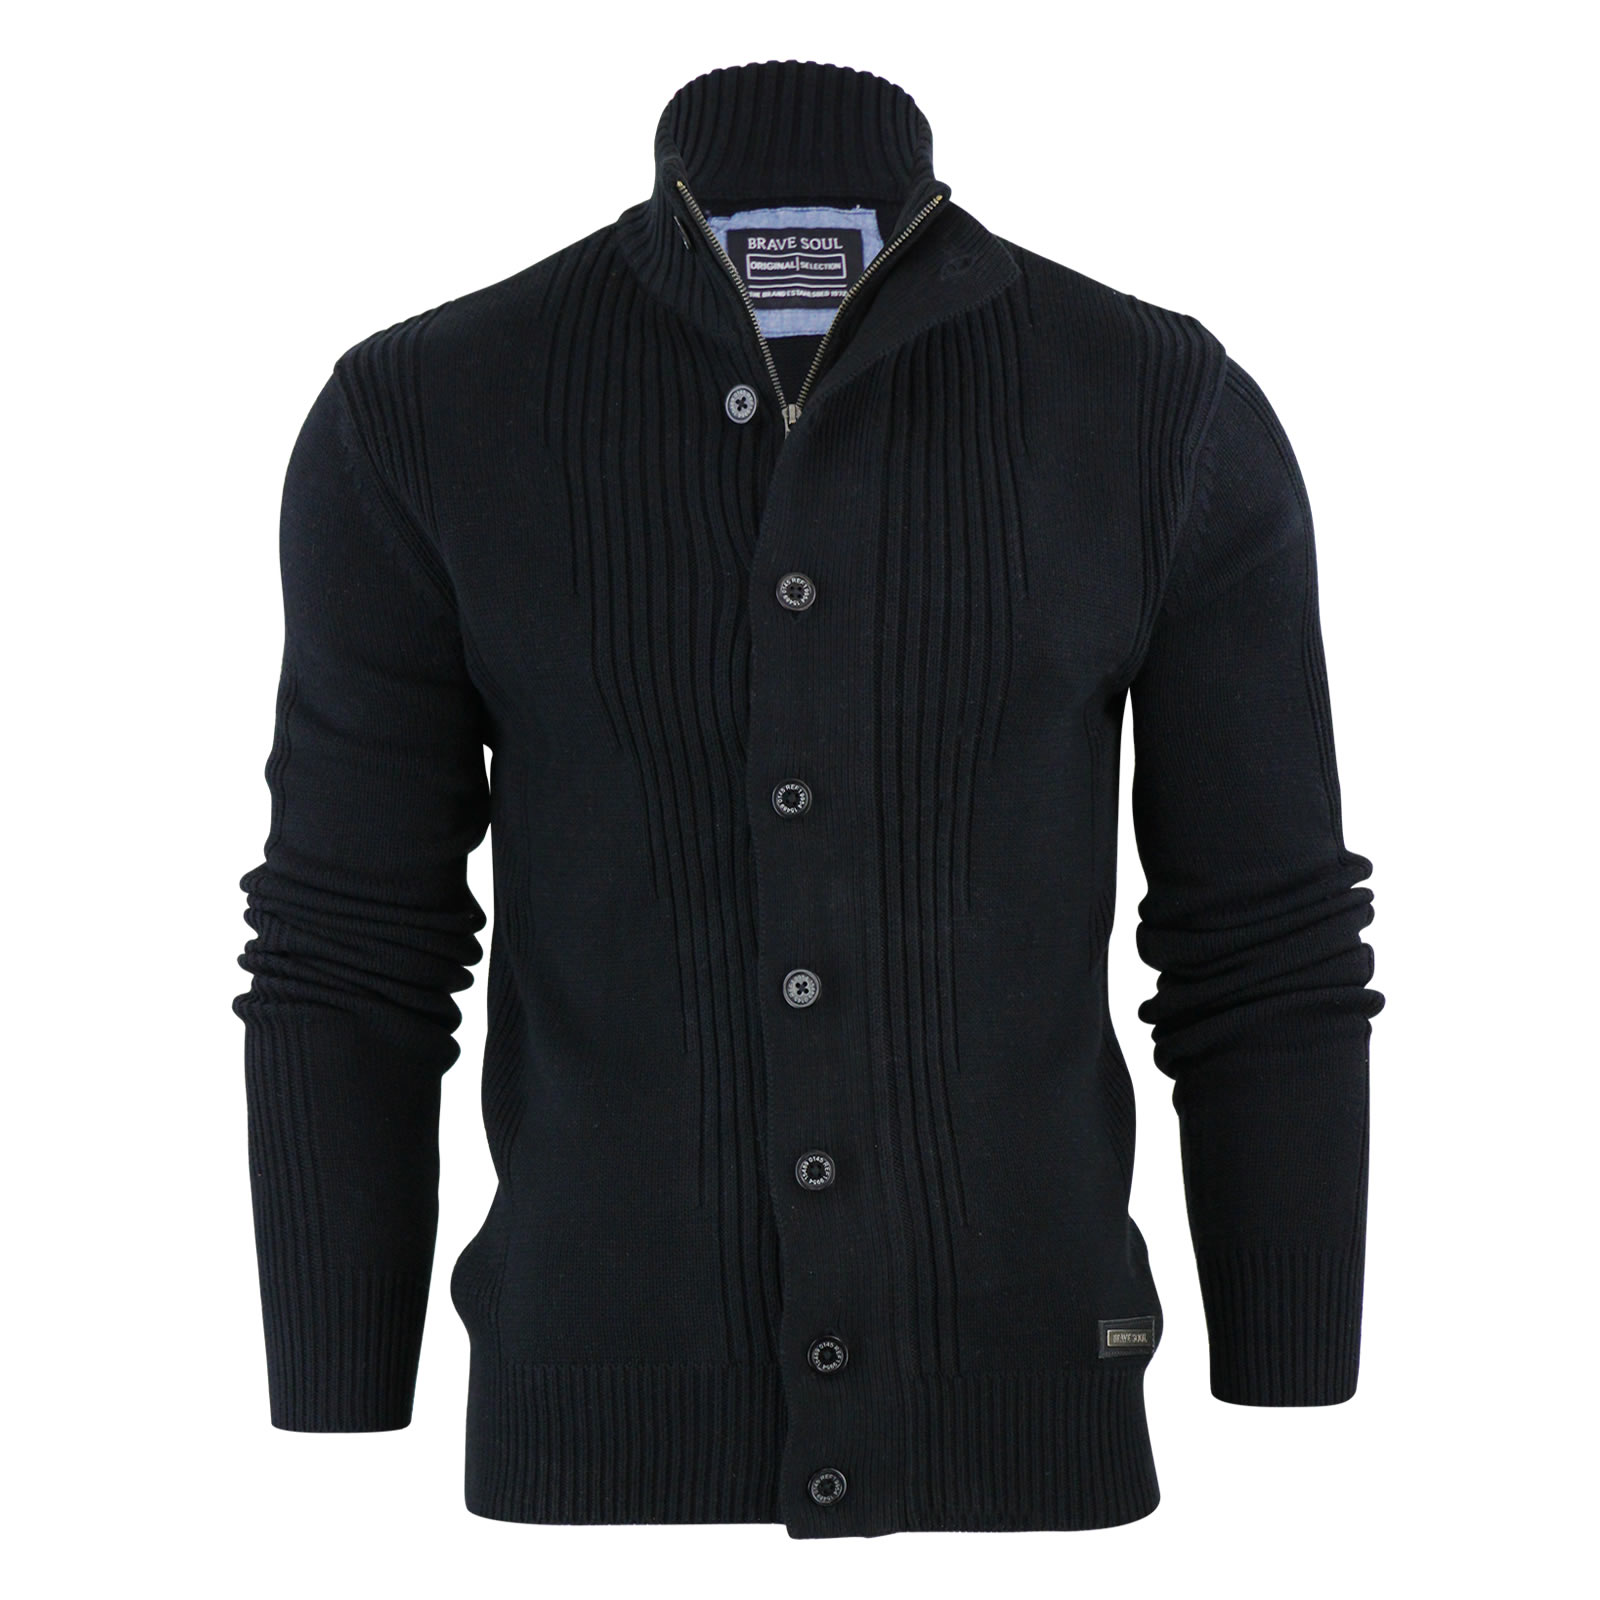 Mens Button Up Cardigan Sweater - Gray Cardigan Sweater